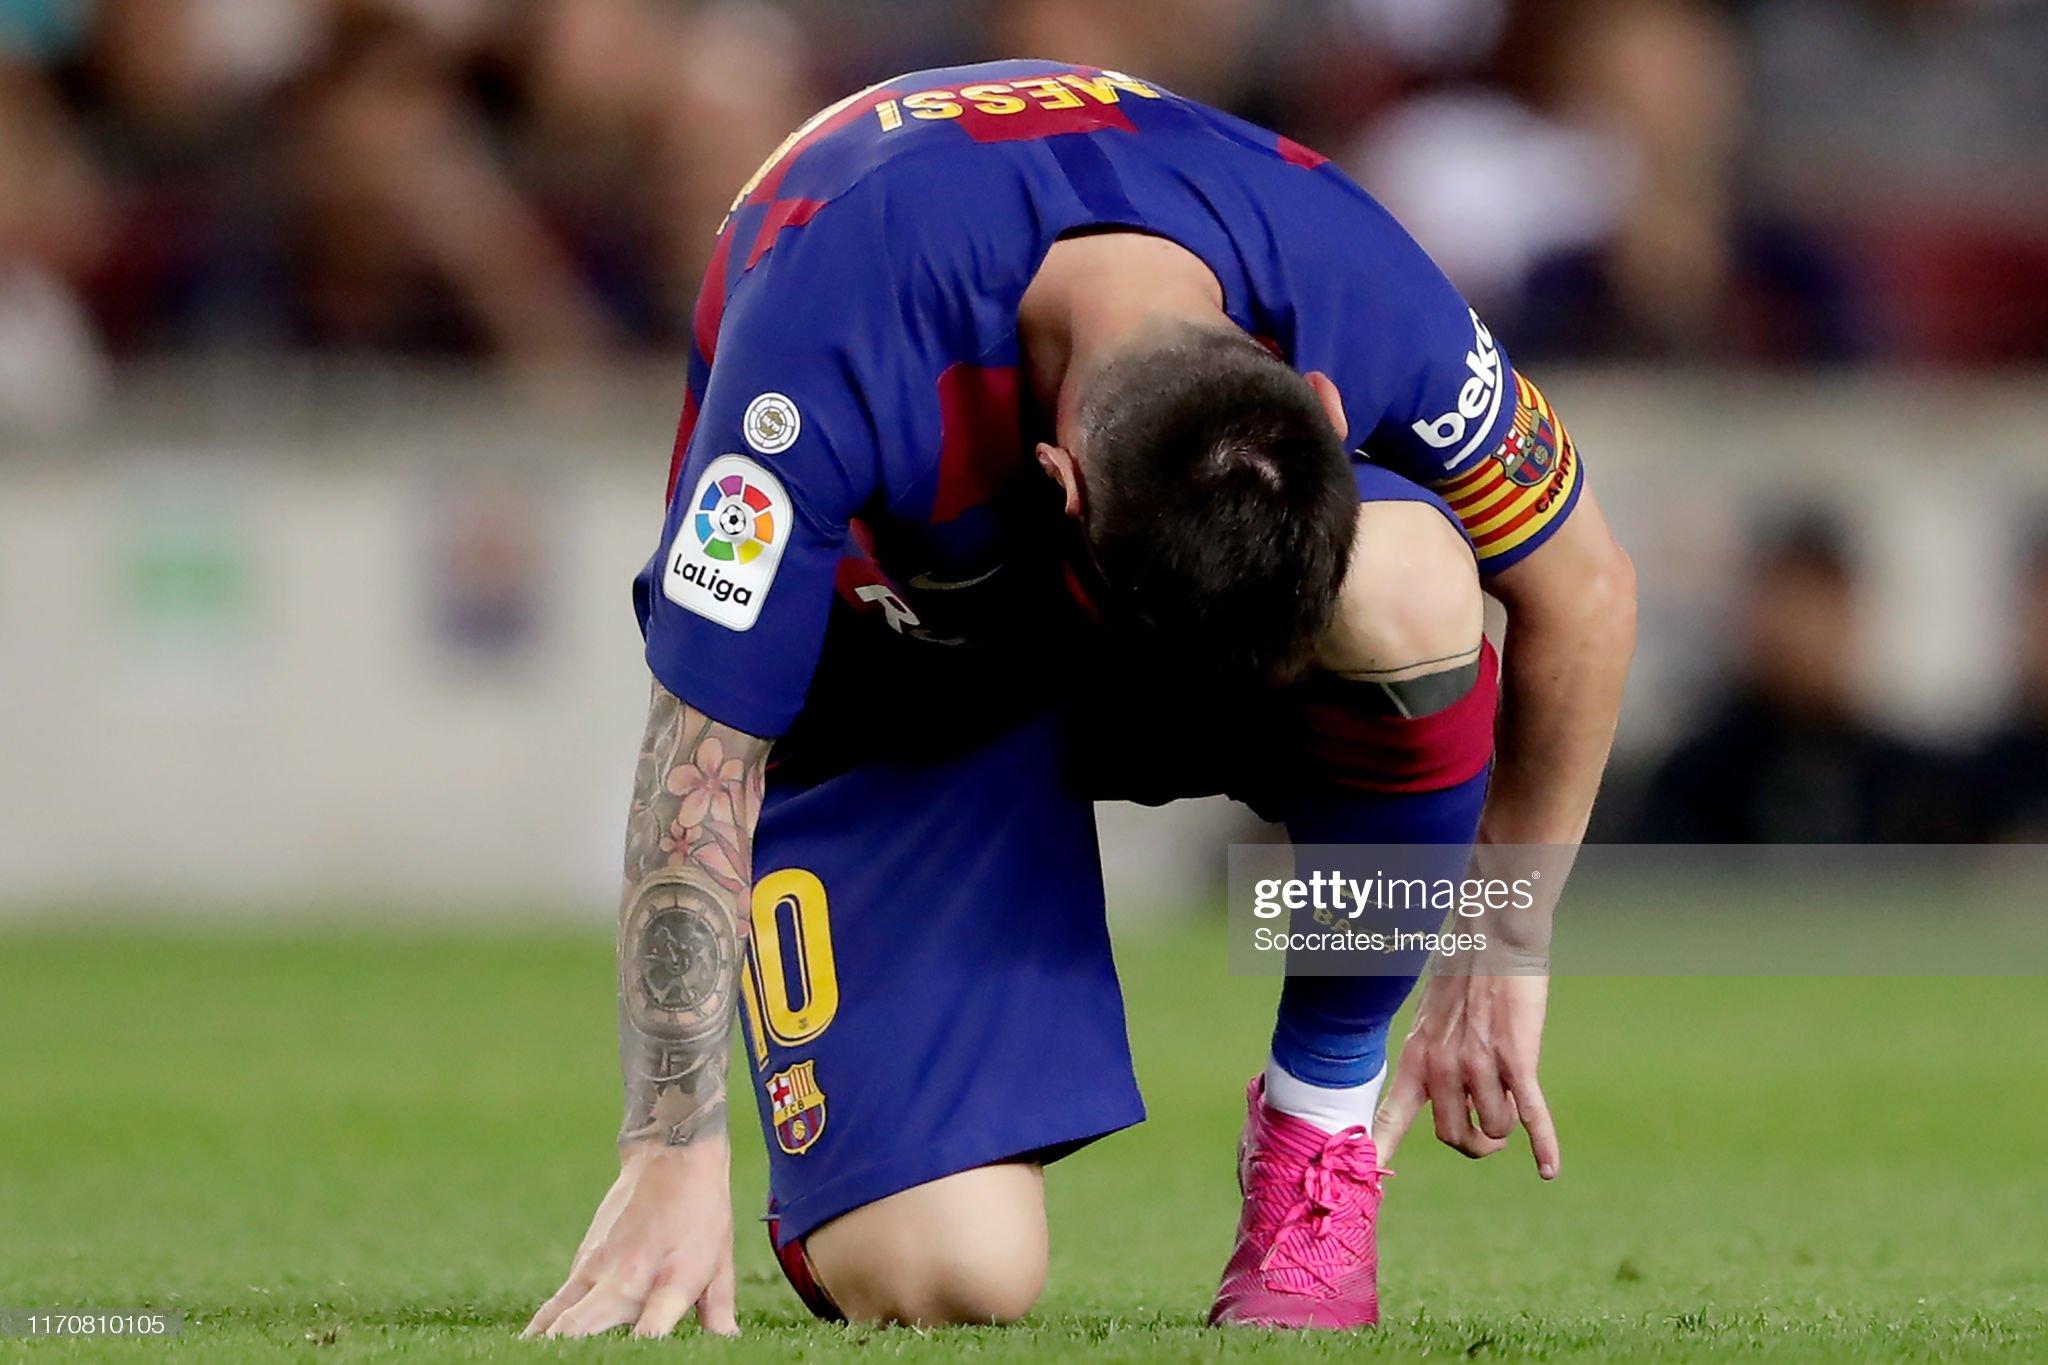 صور مباراة : برشلونة - فياريال 2-1 ( 24-09-2019 )  Lionel-messi-of-fc-barcelona-during-the-la-liga-santander-match-fc-picture-id1170810105?s=2048x2048